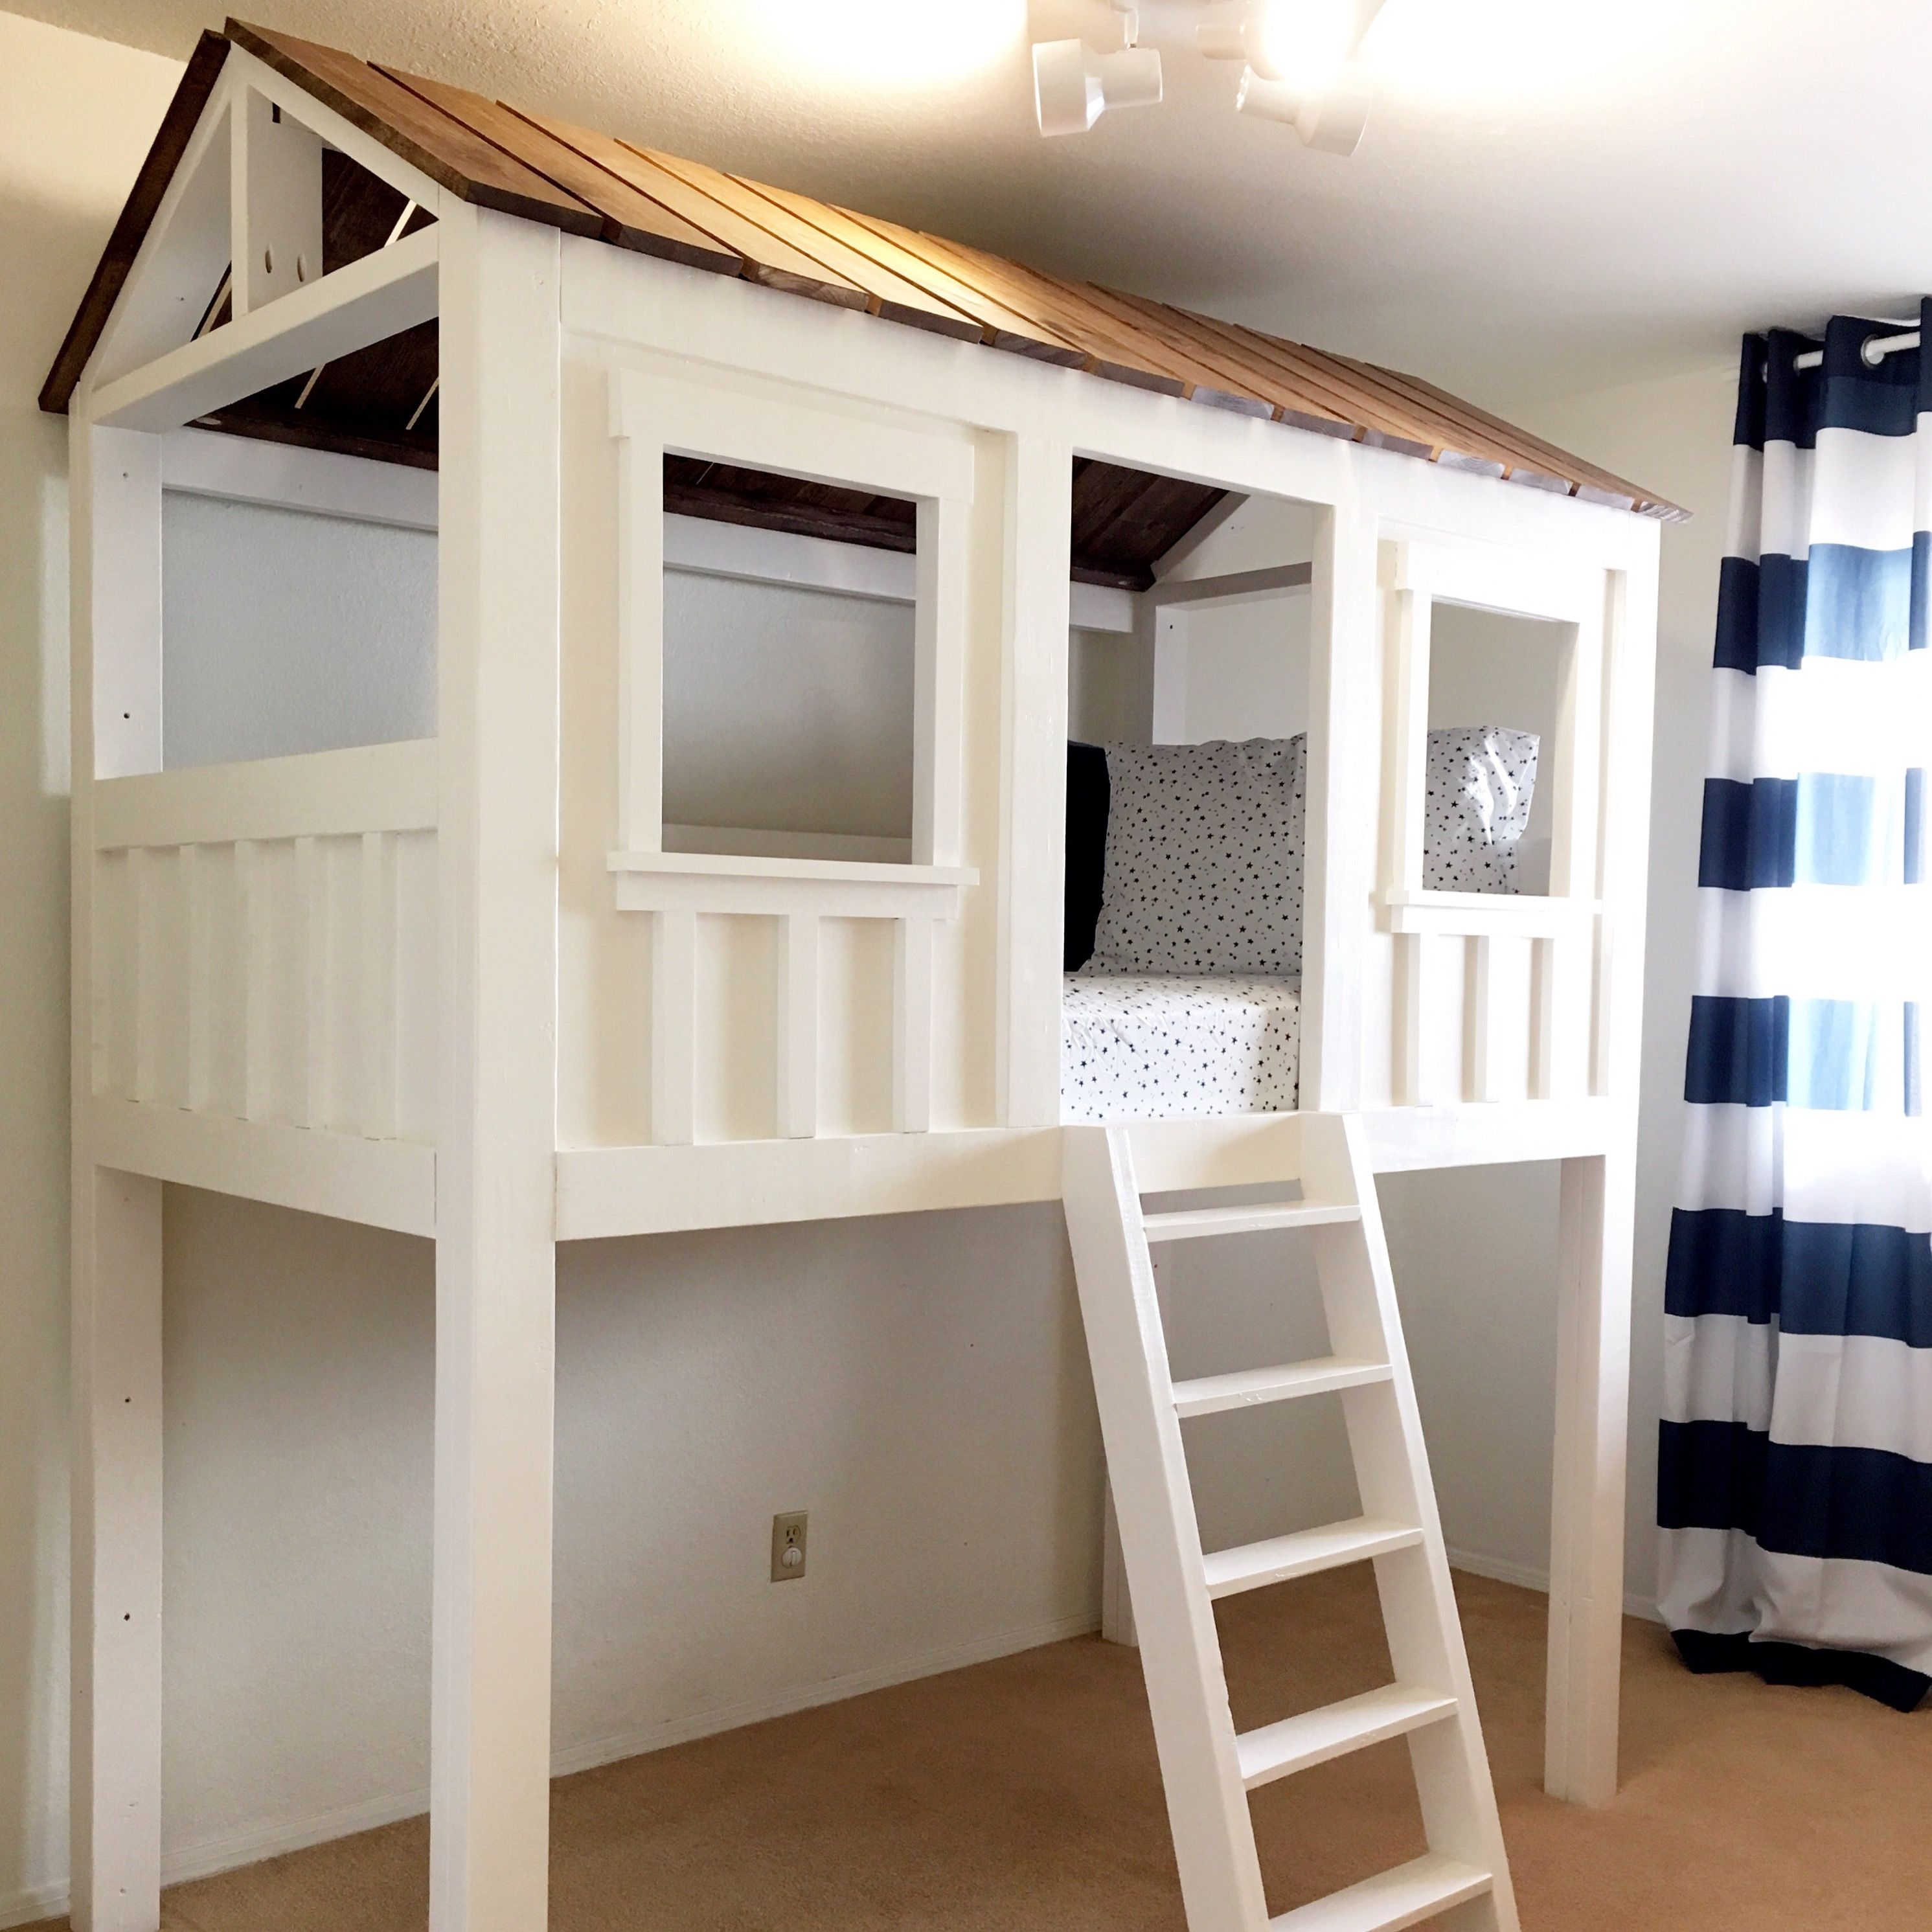 Plywood loft bed plans  Loft Cabin Bed  DIY Projects  kids  Pinterest  Hule Carpintería